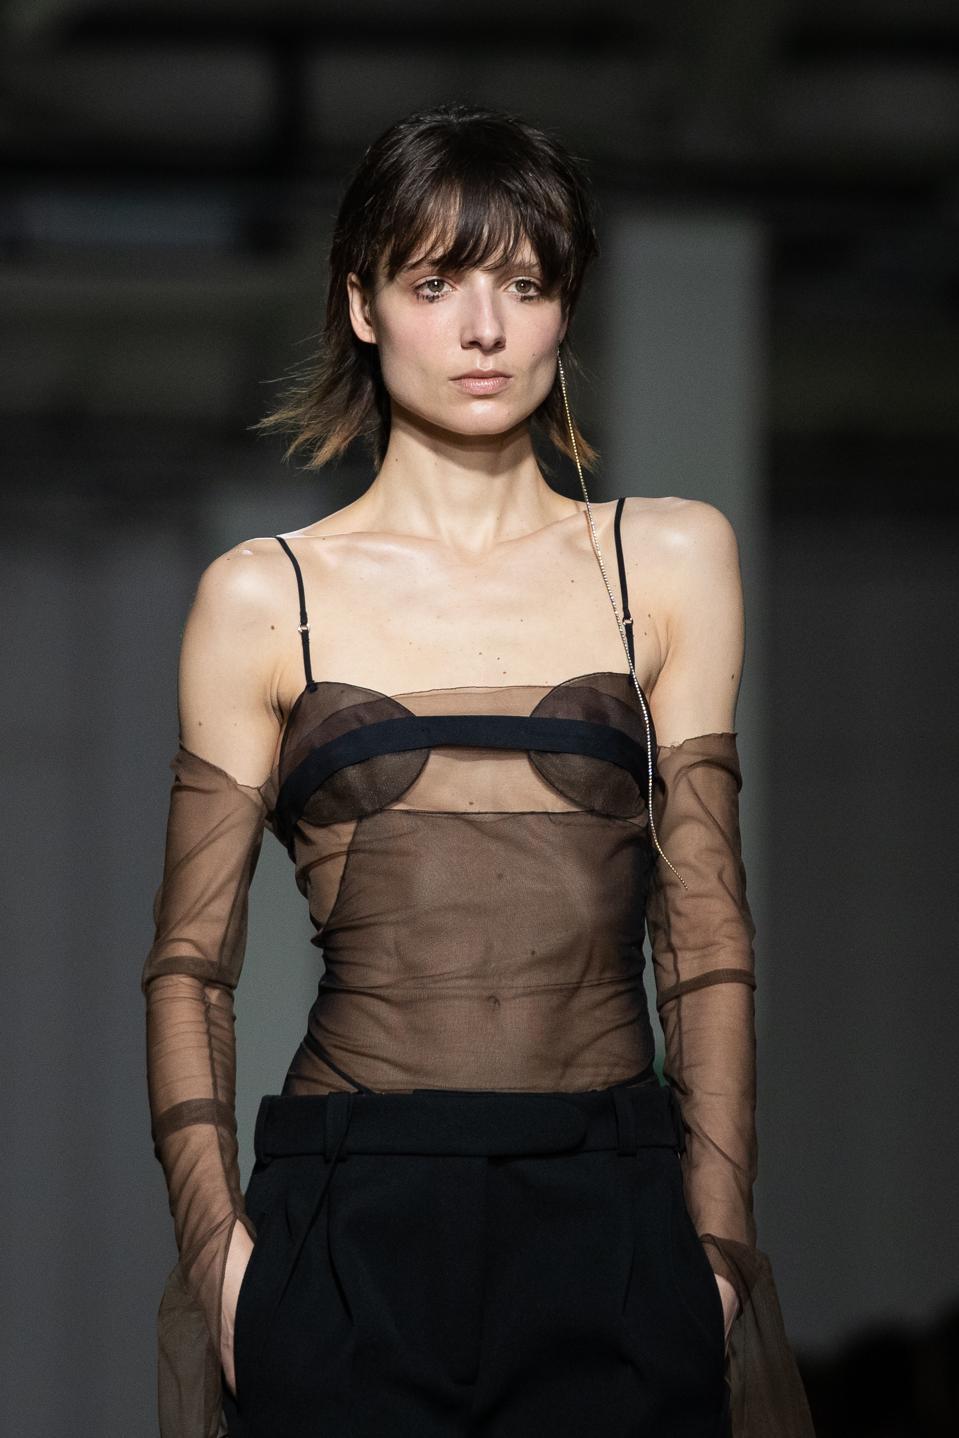 Nensi Dojaka Catwalk - London Fashion Week February 2020